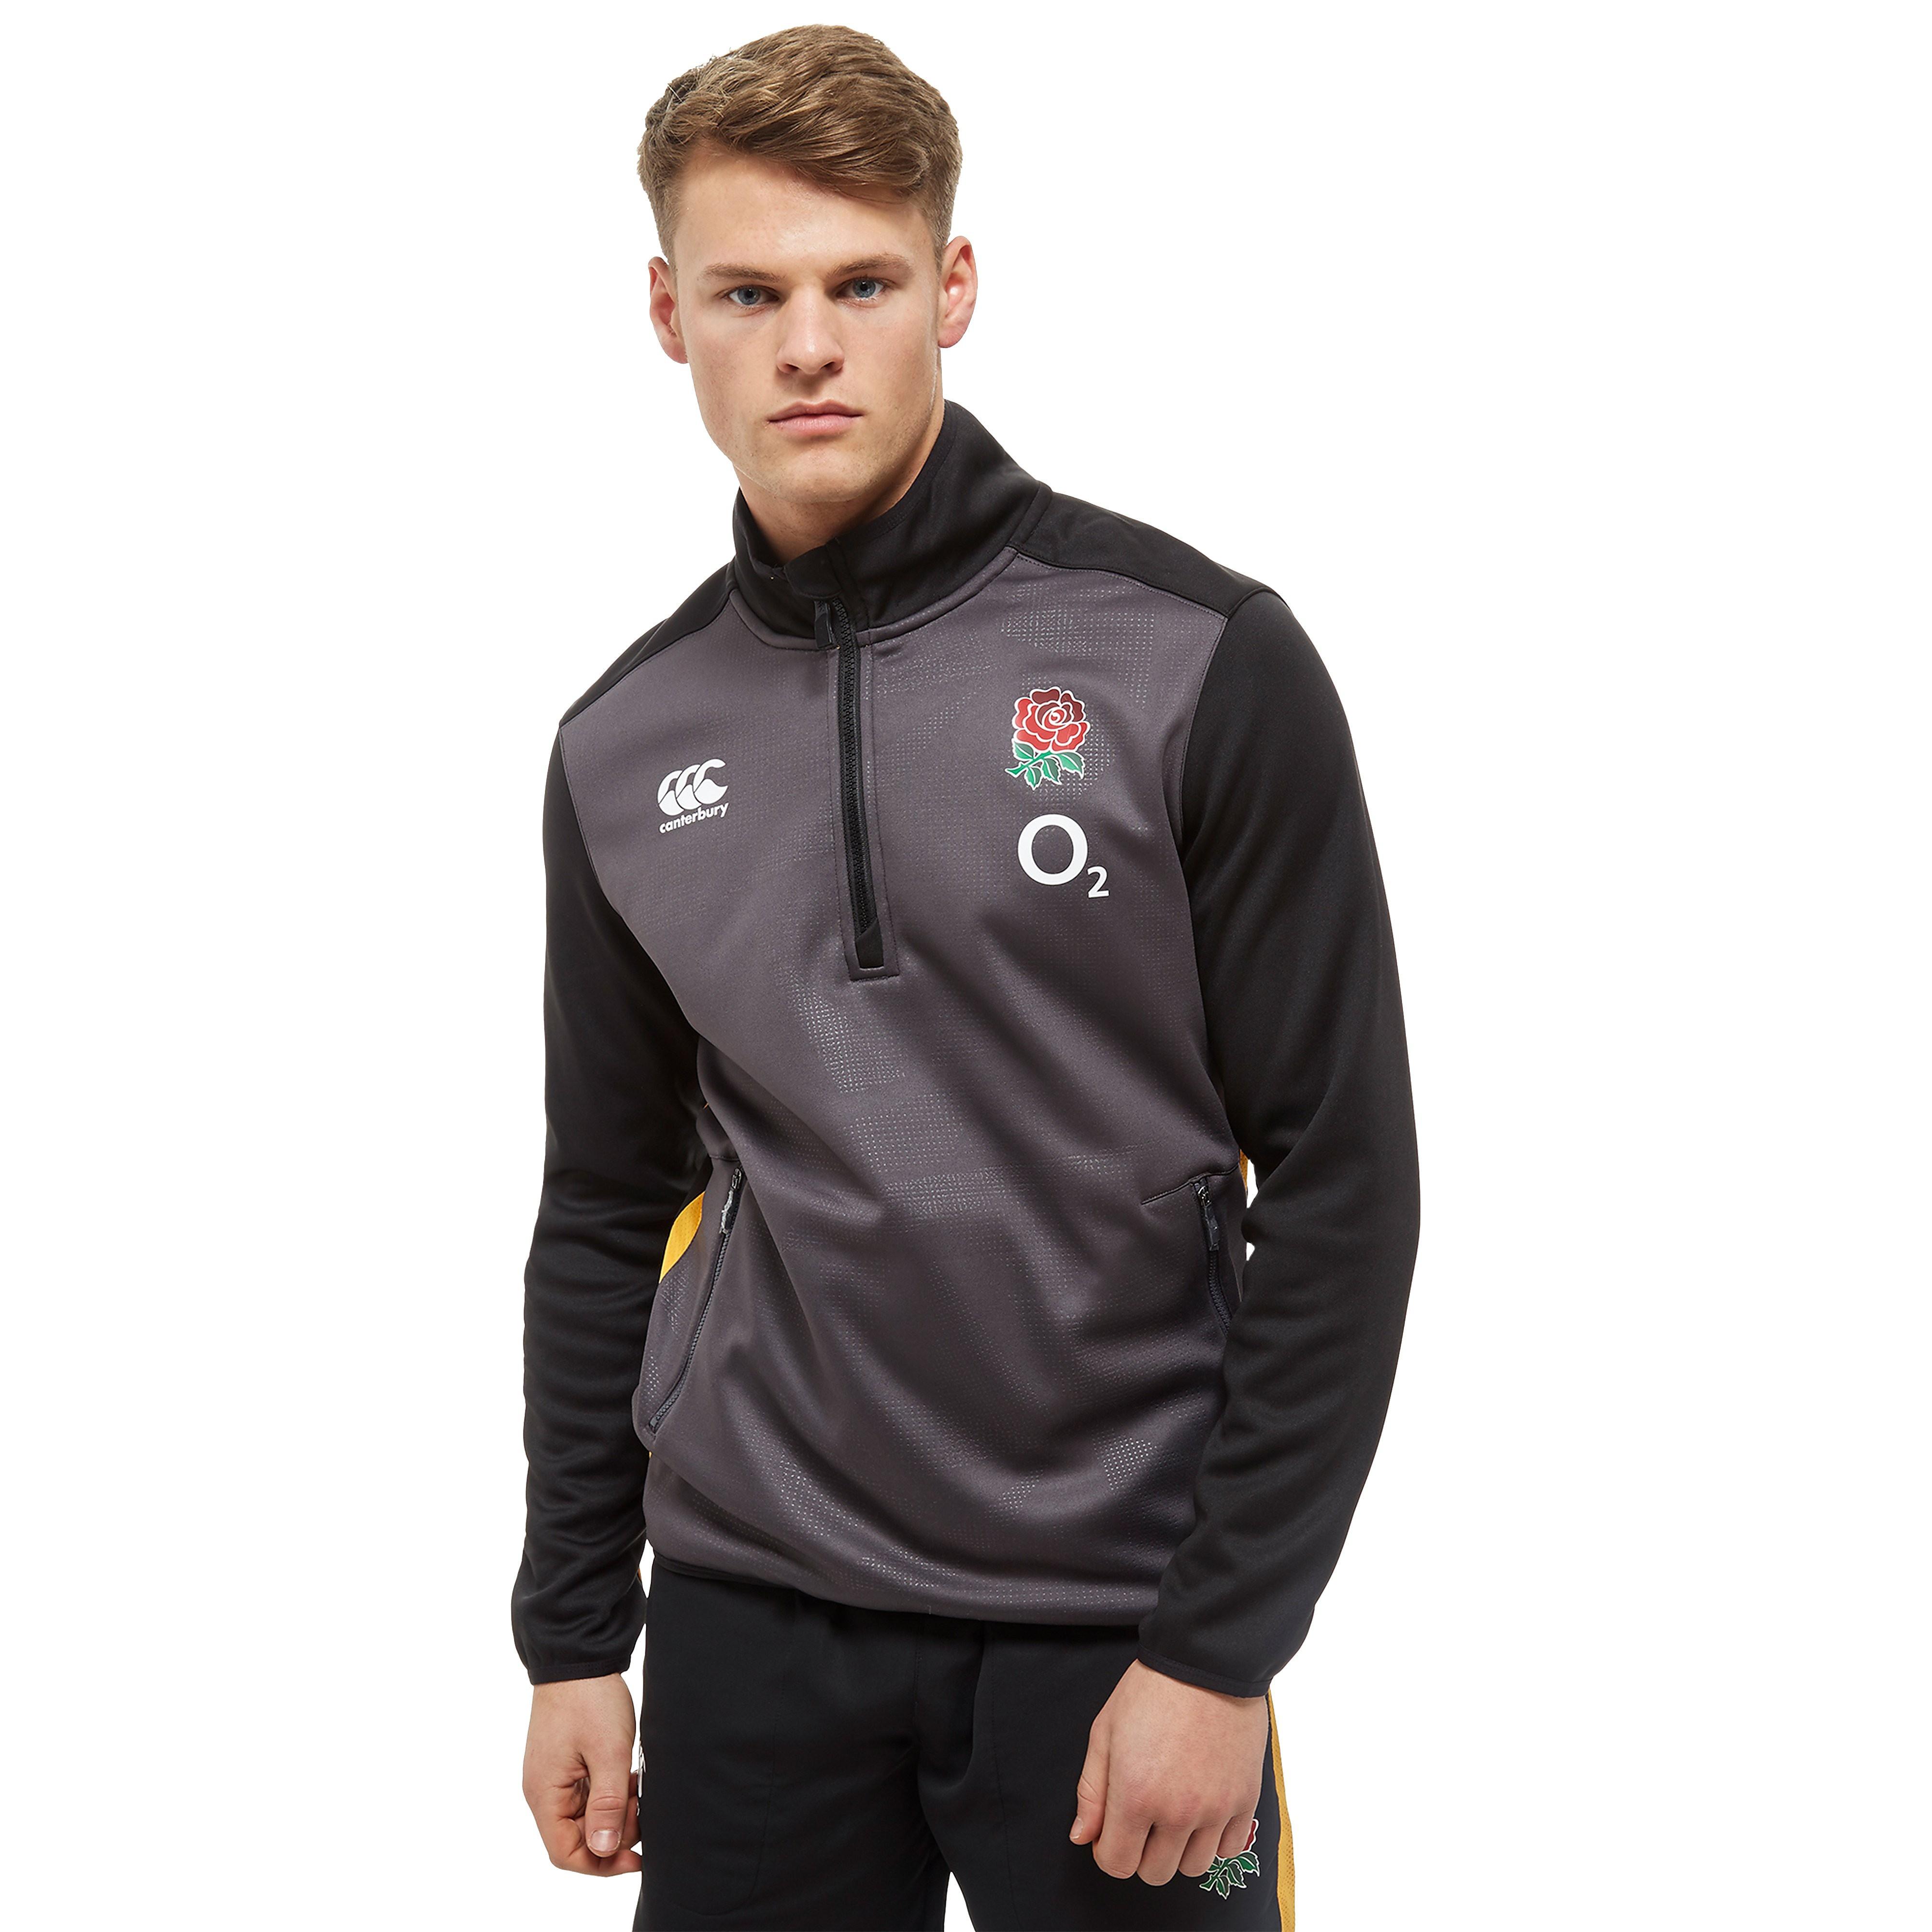 Canterbury England RFU Thermal Layer Men's Fleece Top